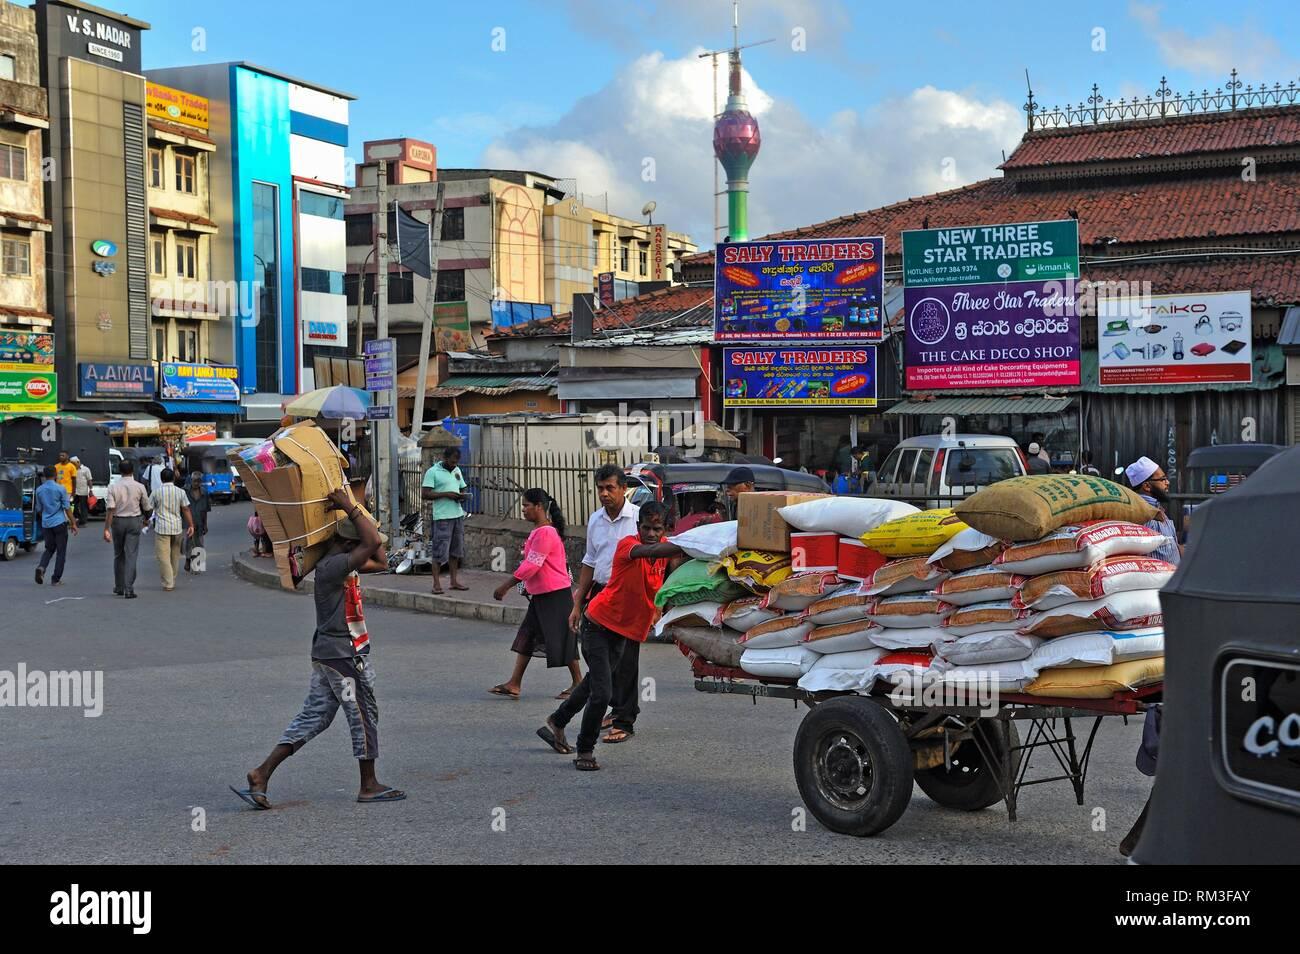 MainStreet and Dam Street roundabout, Pettah neighbourhood, Colombo, Sri Lanka, Indian subcontinent, South Asia. - Stock Image